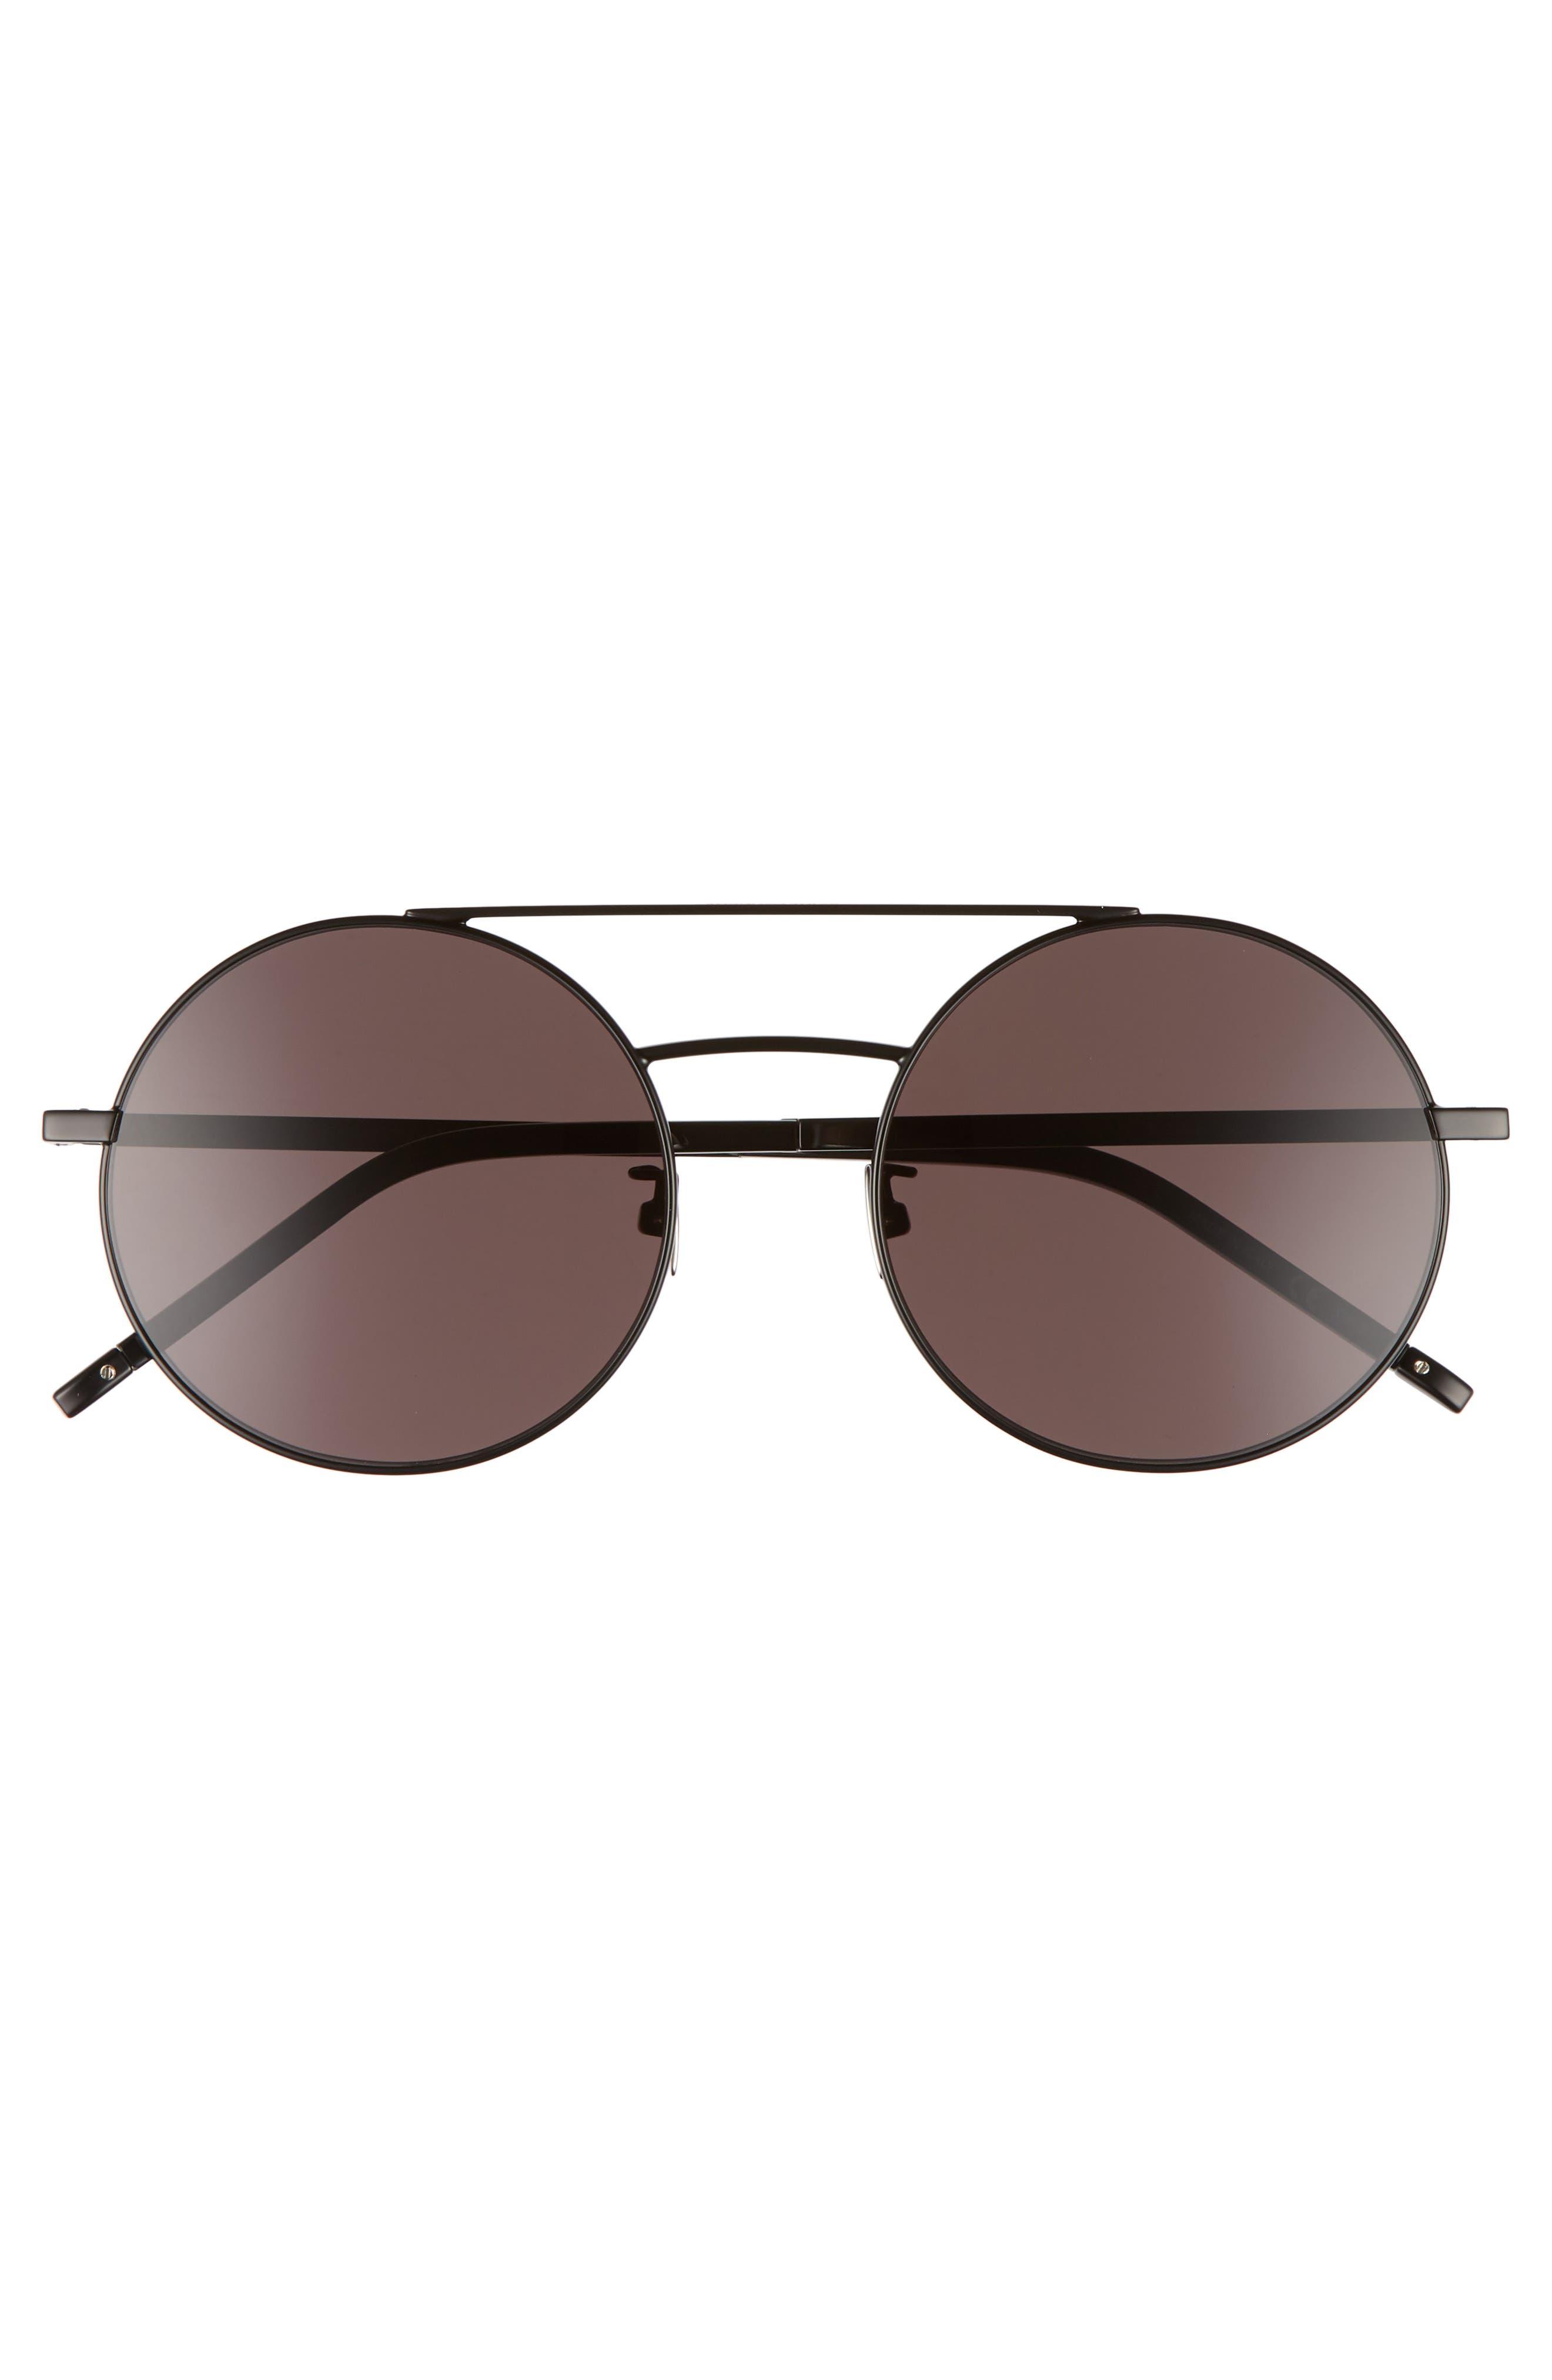 SL 210/F 56mm Round Aviator Sunglasses,                             Alternate thumbnail 2, color,                             002